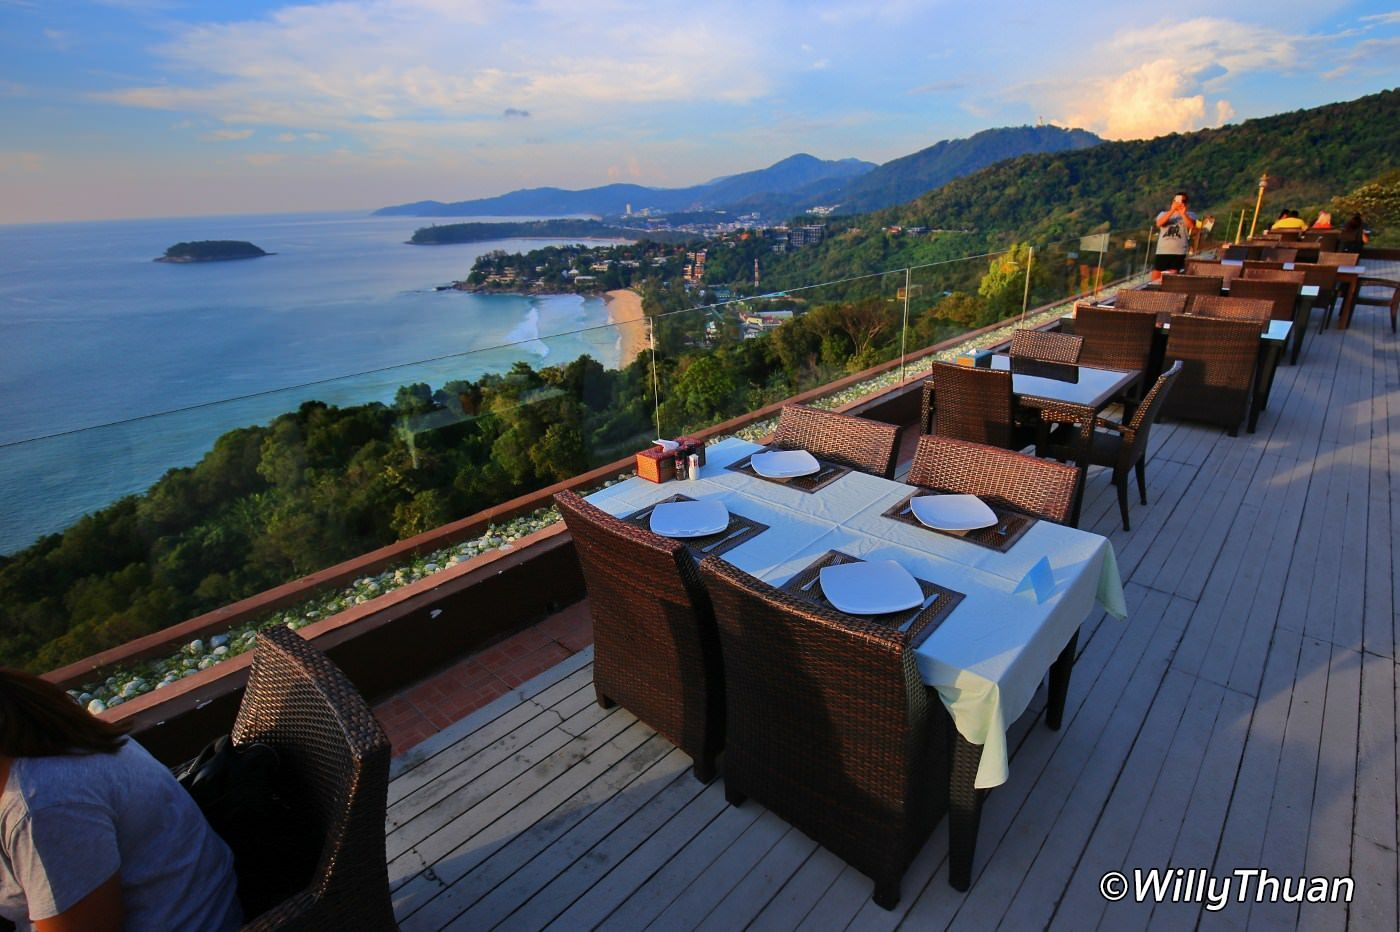 10 Best Rooftop Bars in Phuket (Updated 2018) - Phuket 101 ...